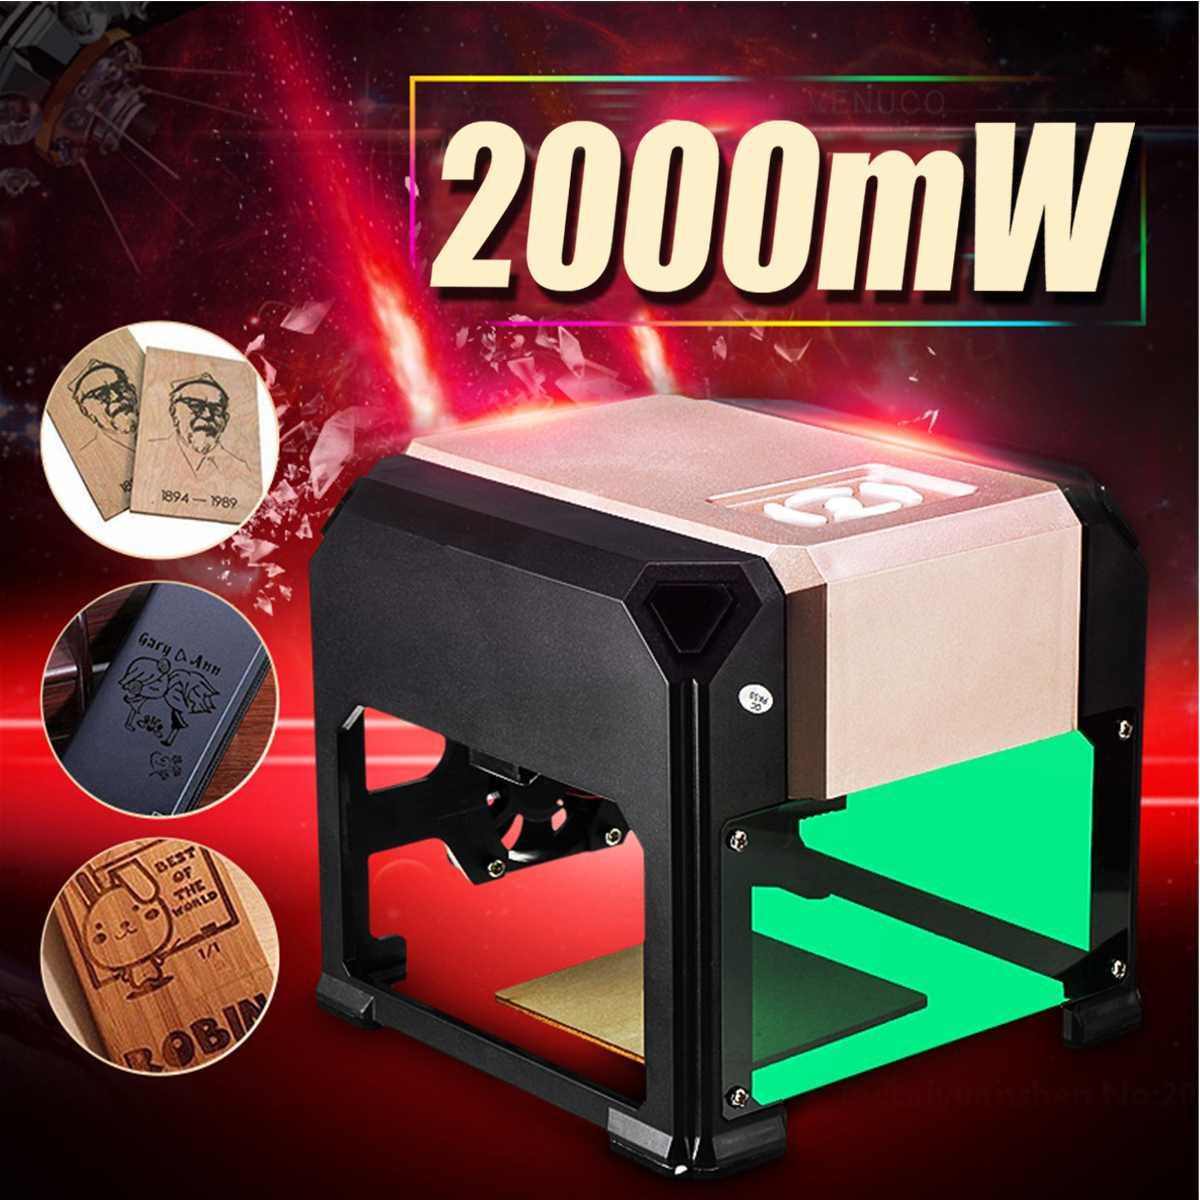 1500mW CNC USB DIY Logo Mini Desktop Laser Engraving Machine Engraver Printer Carver1500mW CNC USB DIY Logo Mini Desktop Laser Engraving Machine Engraver Printer Carver